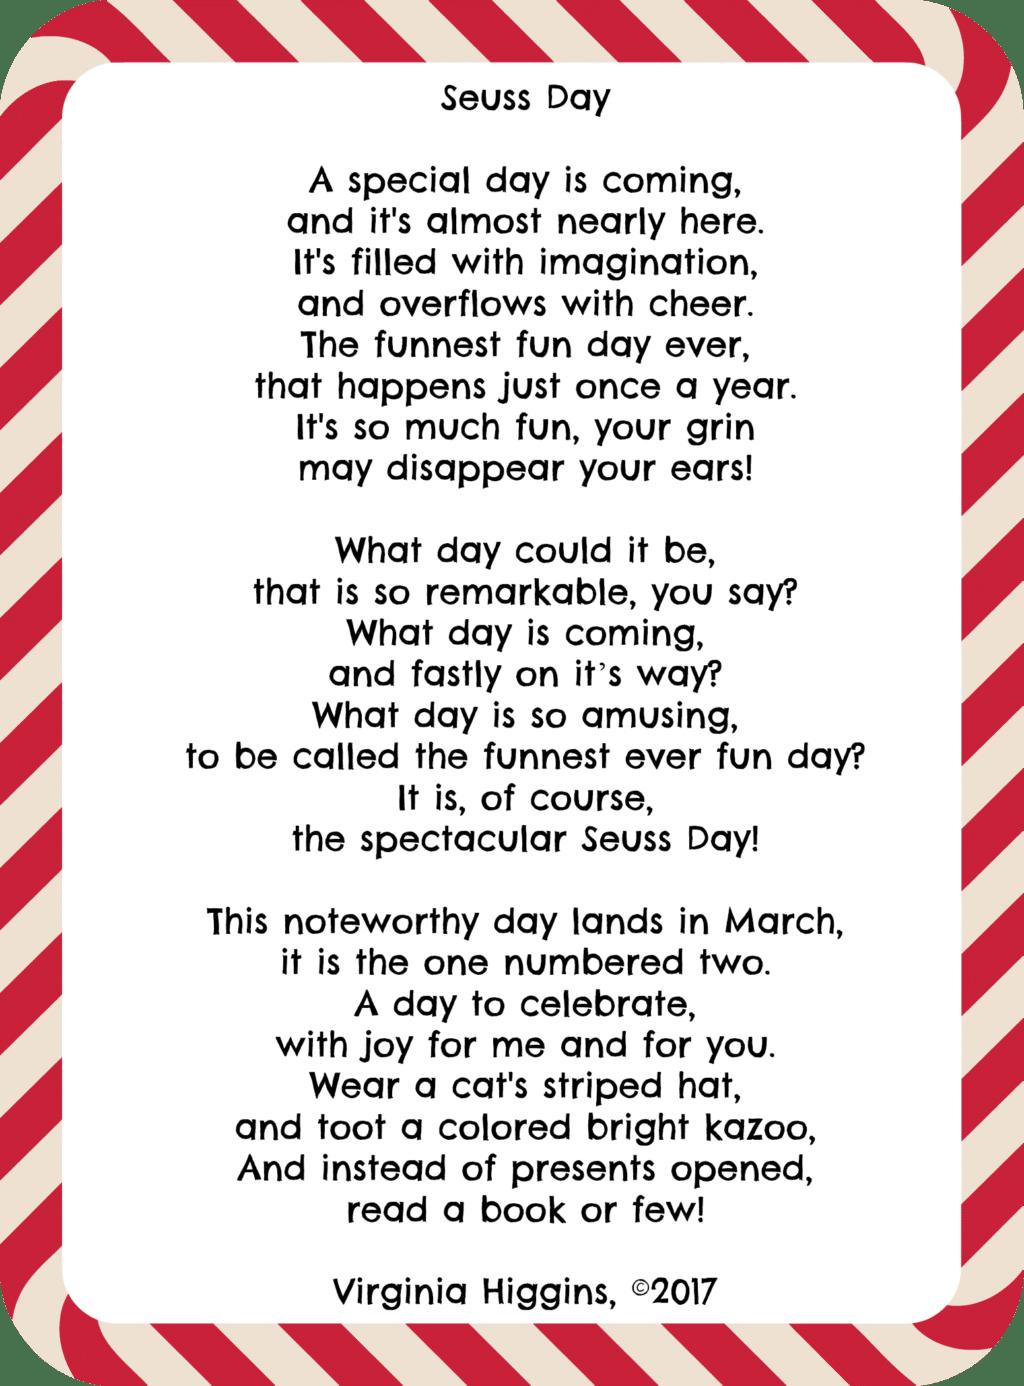 5x7 Printable Seuss Day Poem by Virginia Higgins, ©2017 at thatbaldchick.com